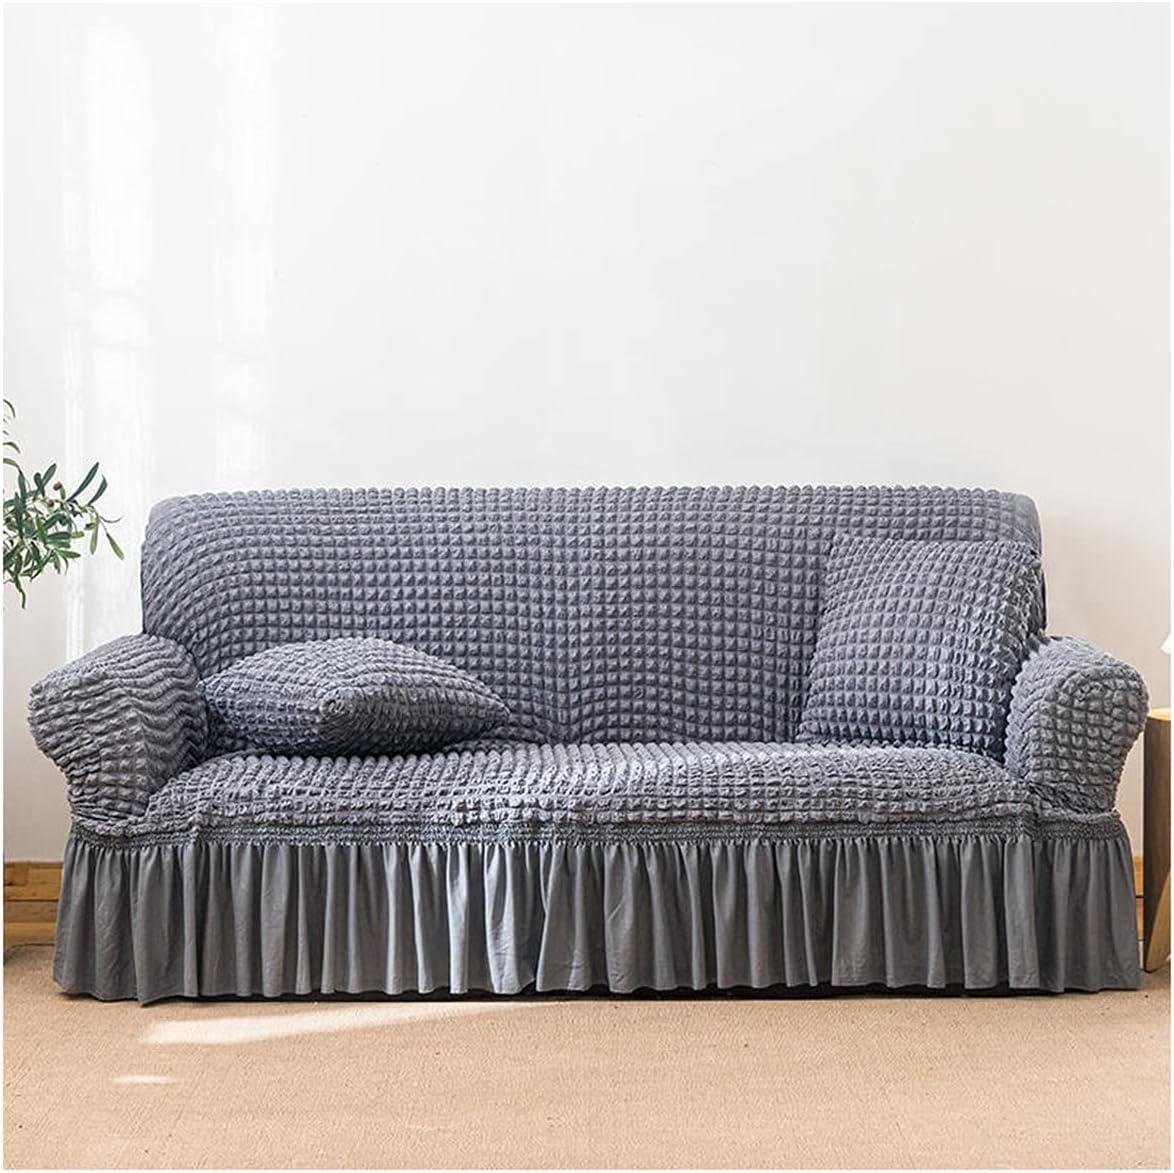 LYLSXY Bubble Lattice Elegant Stretch Sofa Loveseat Cover Popular Max 69% OFF product